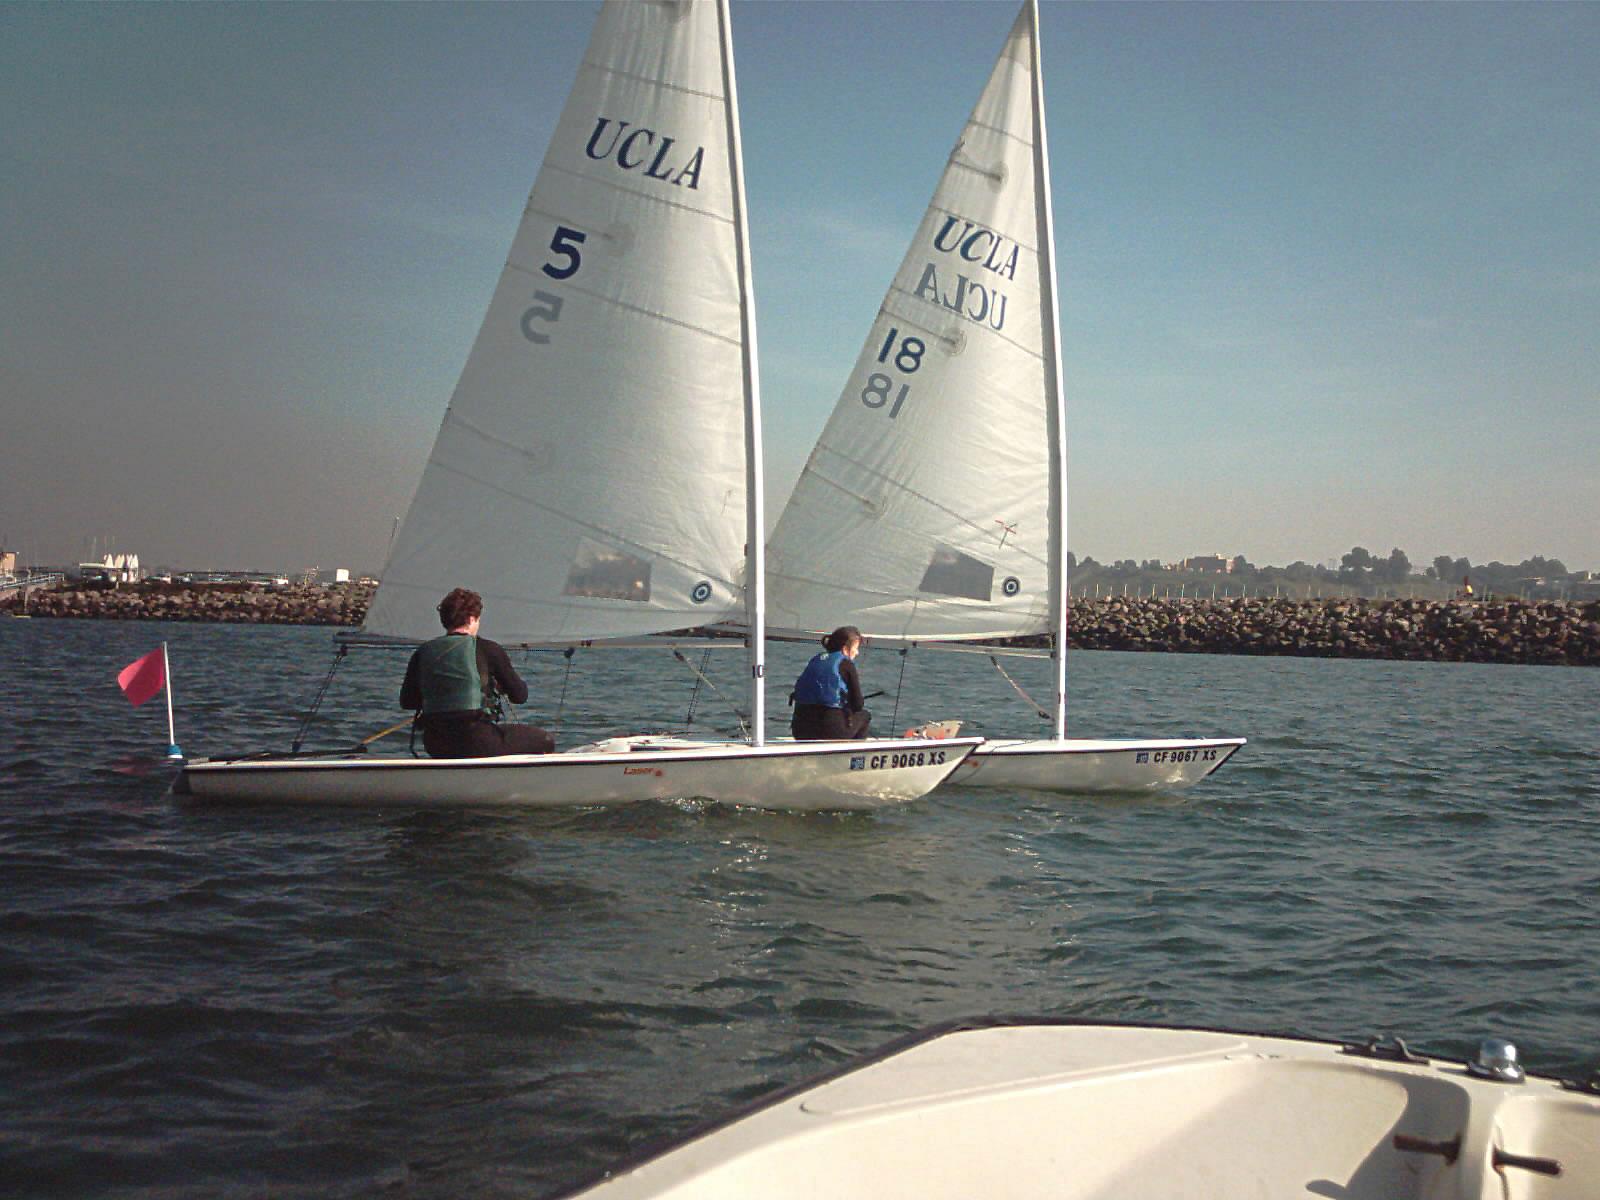 laser dinghy sail area